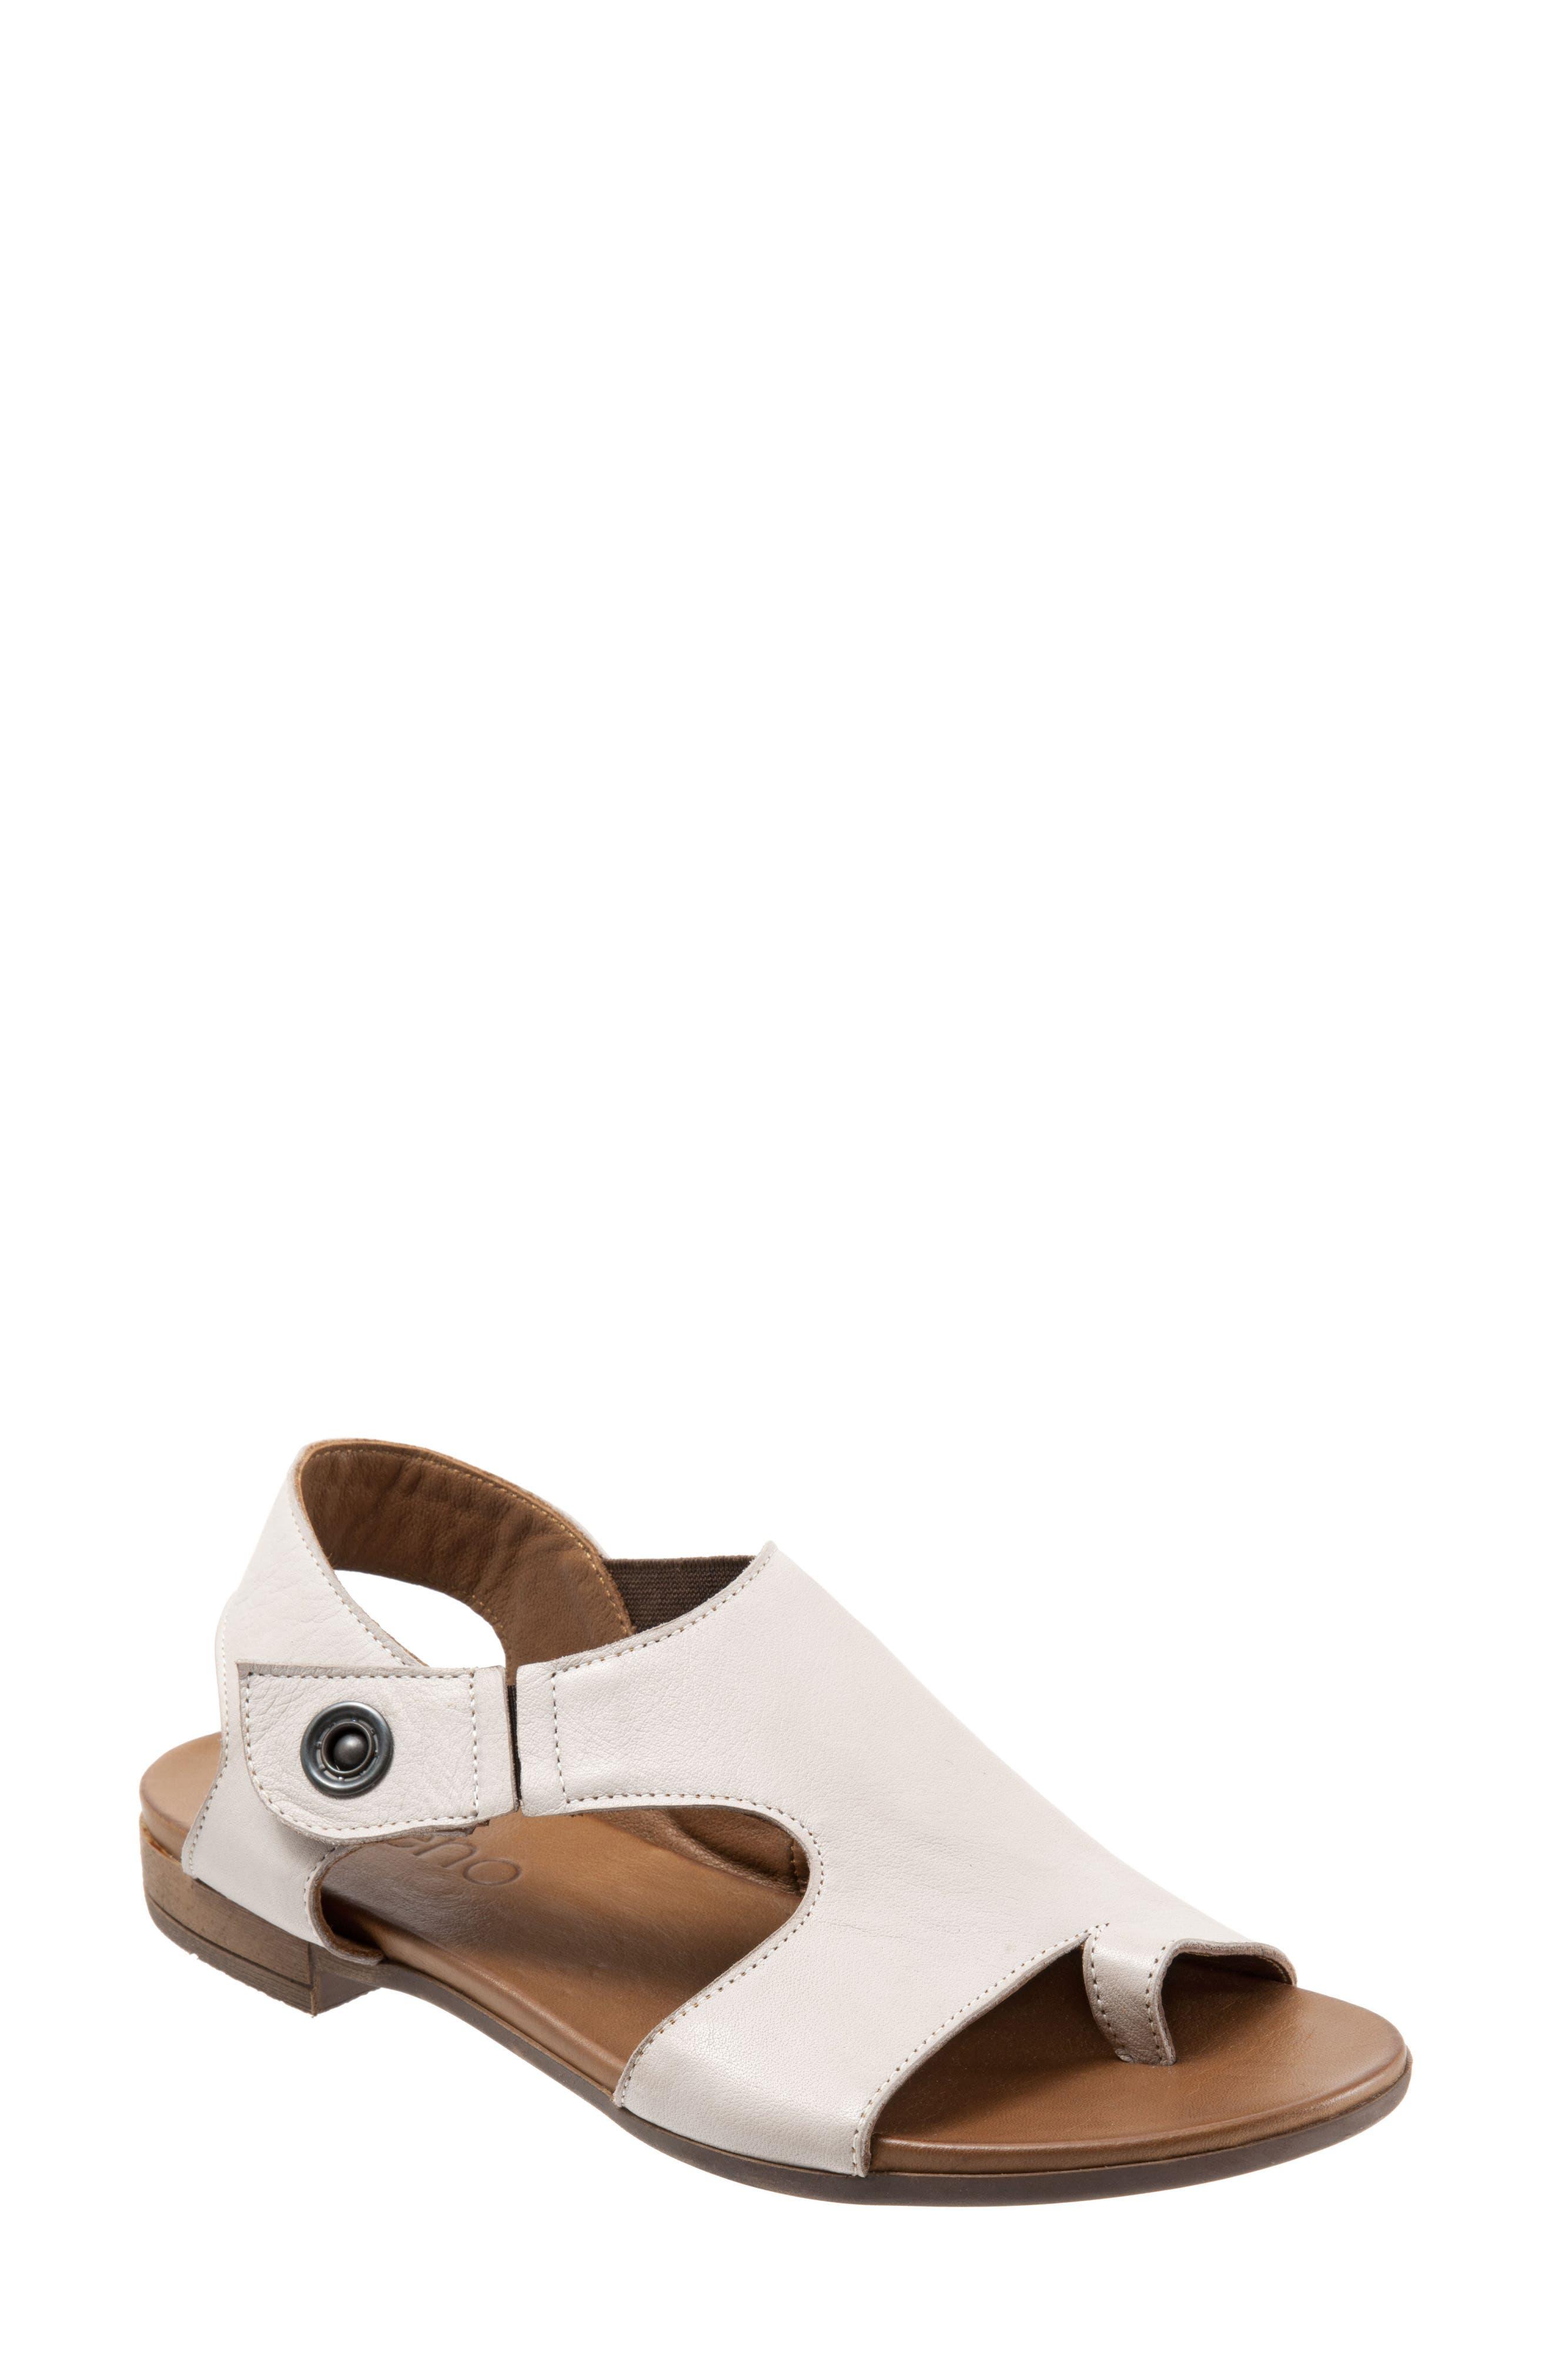 Tessa Sandal,                         Main,                         color, Light Grey Leather